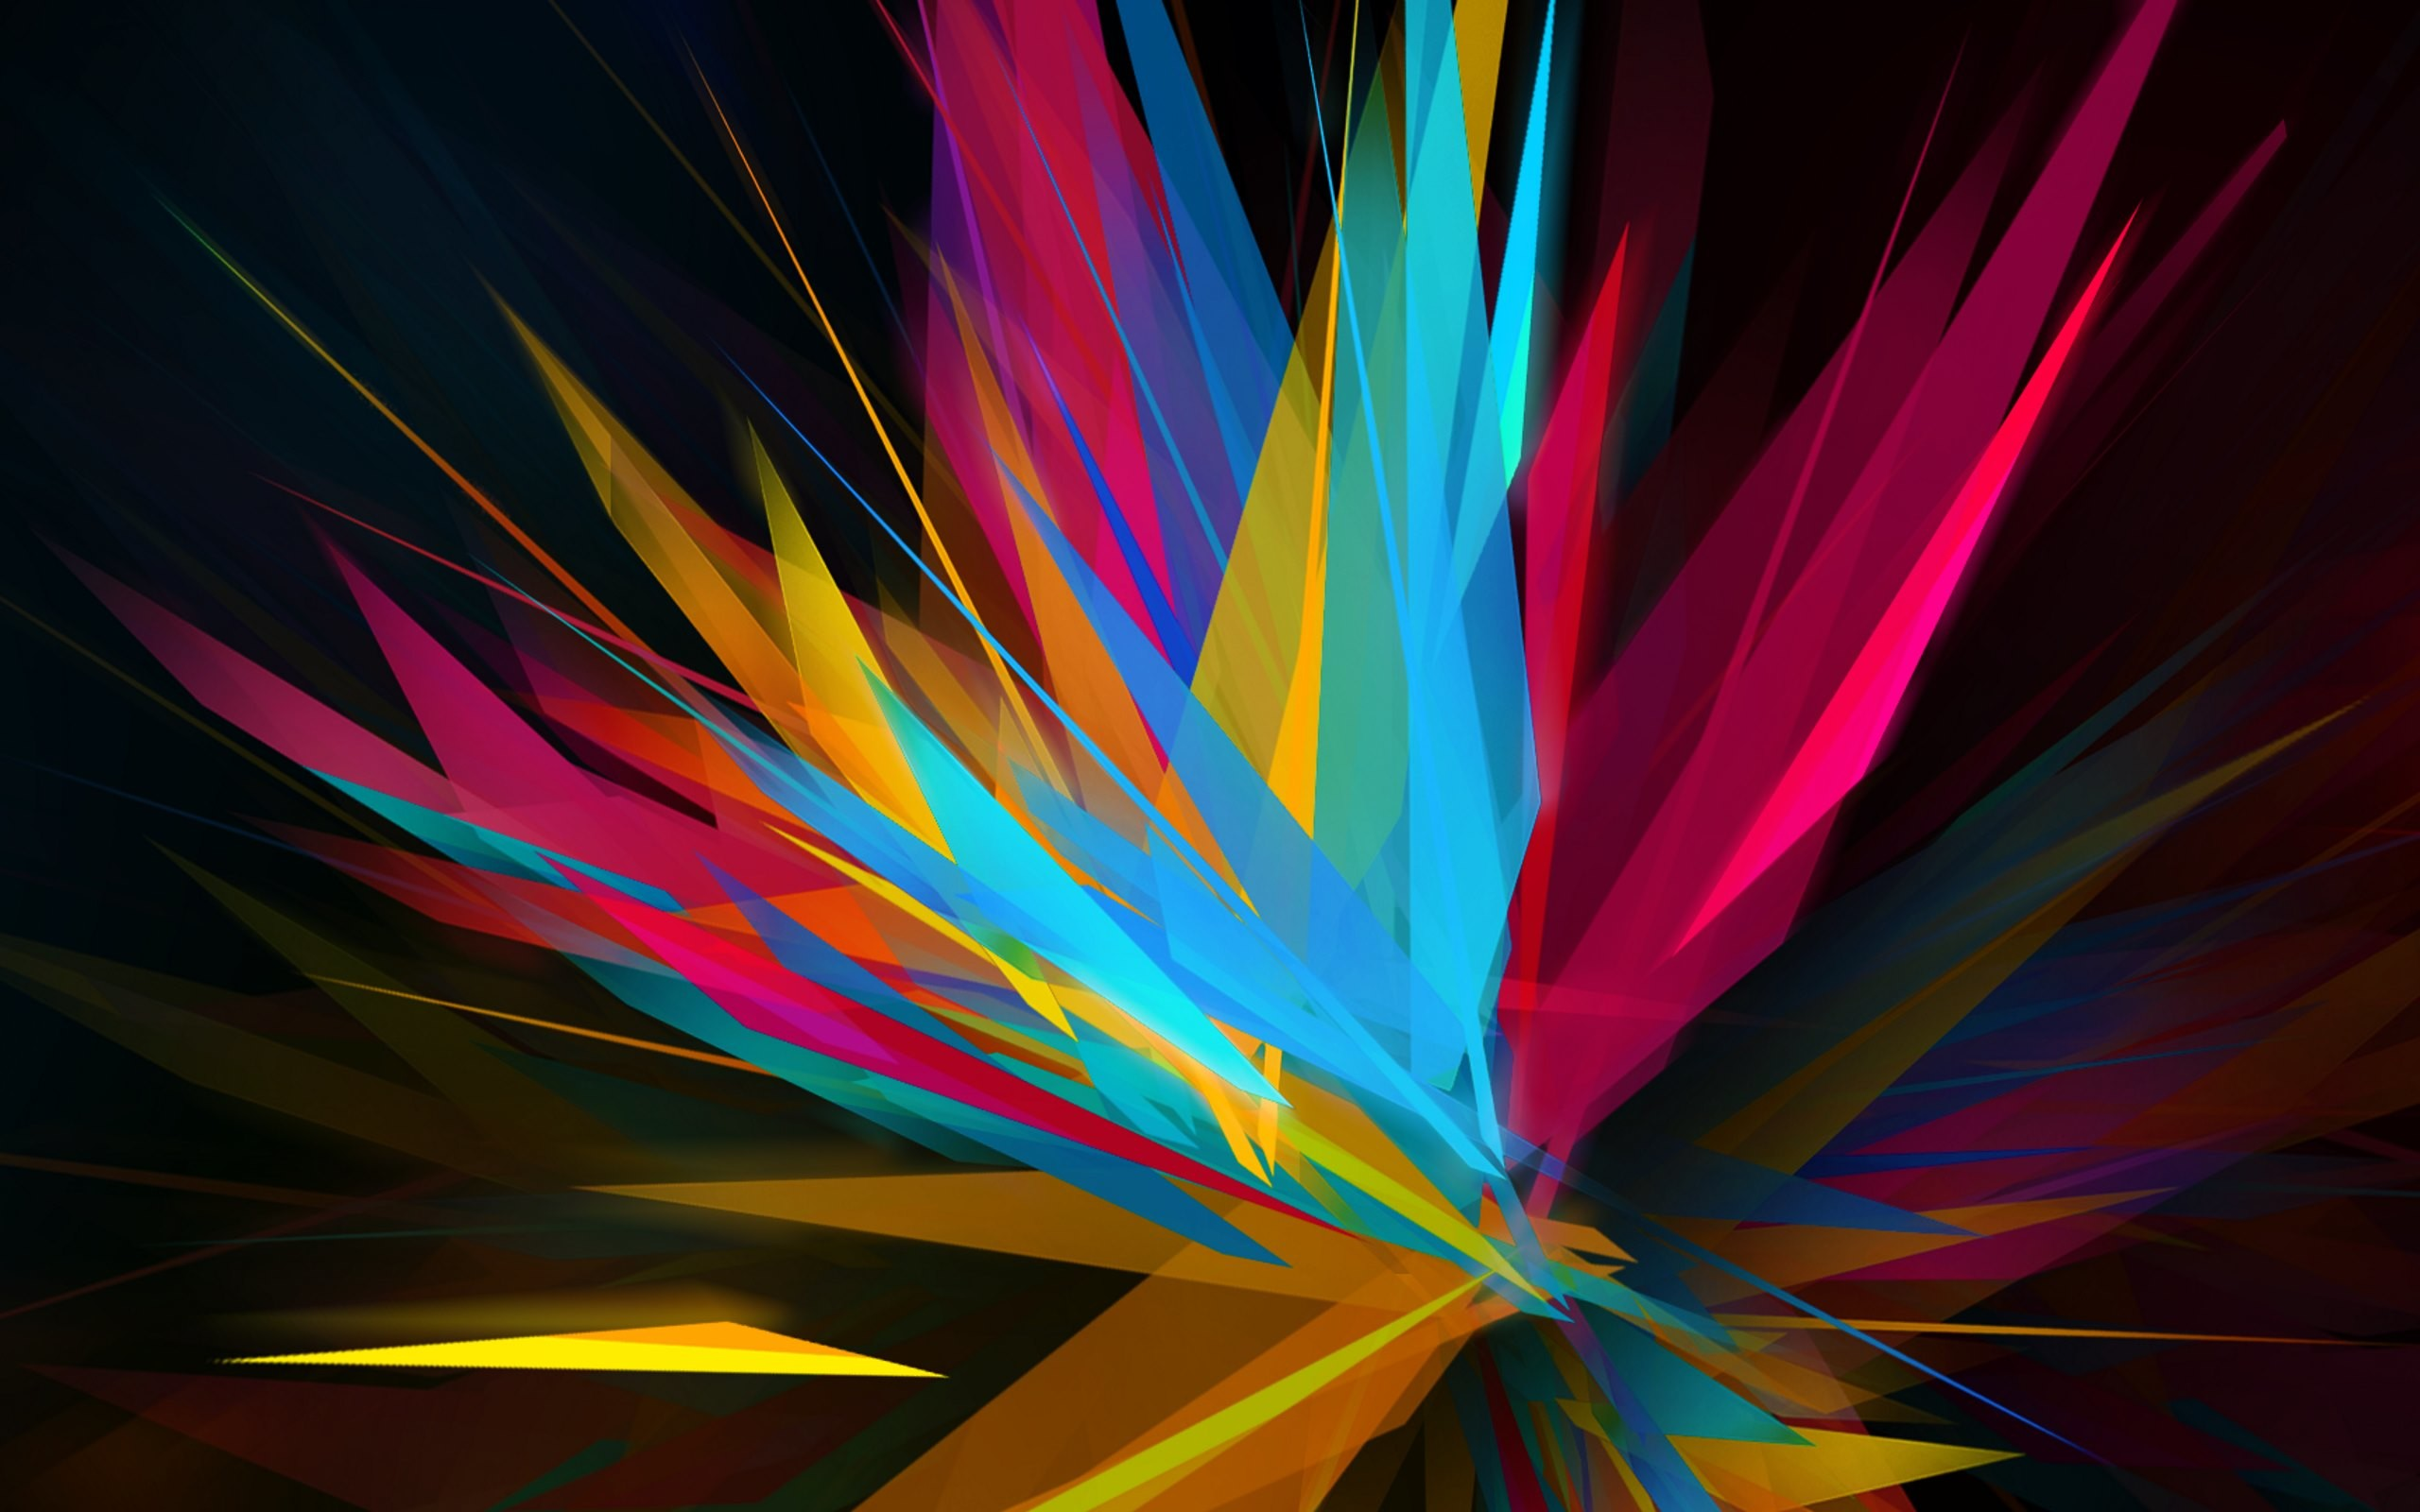 Abstract Sharp Shapes Wallpaper · HD Wallpapers